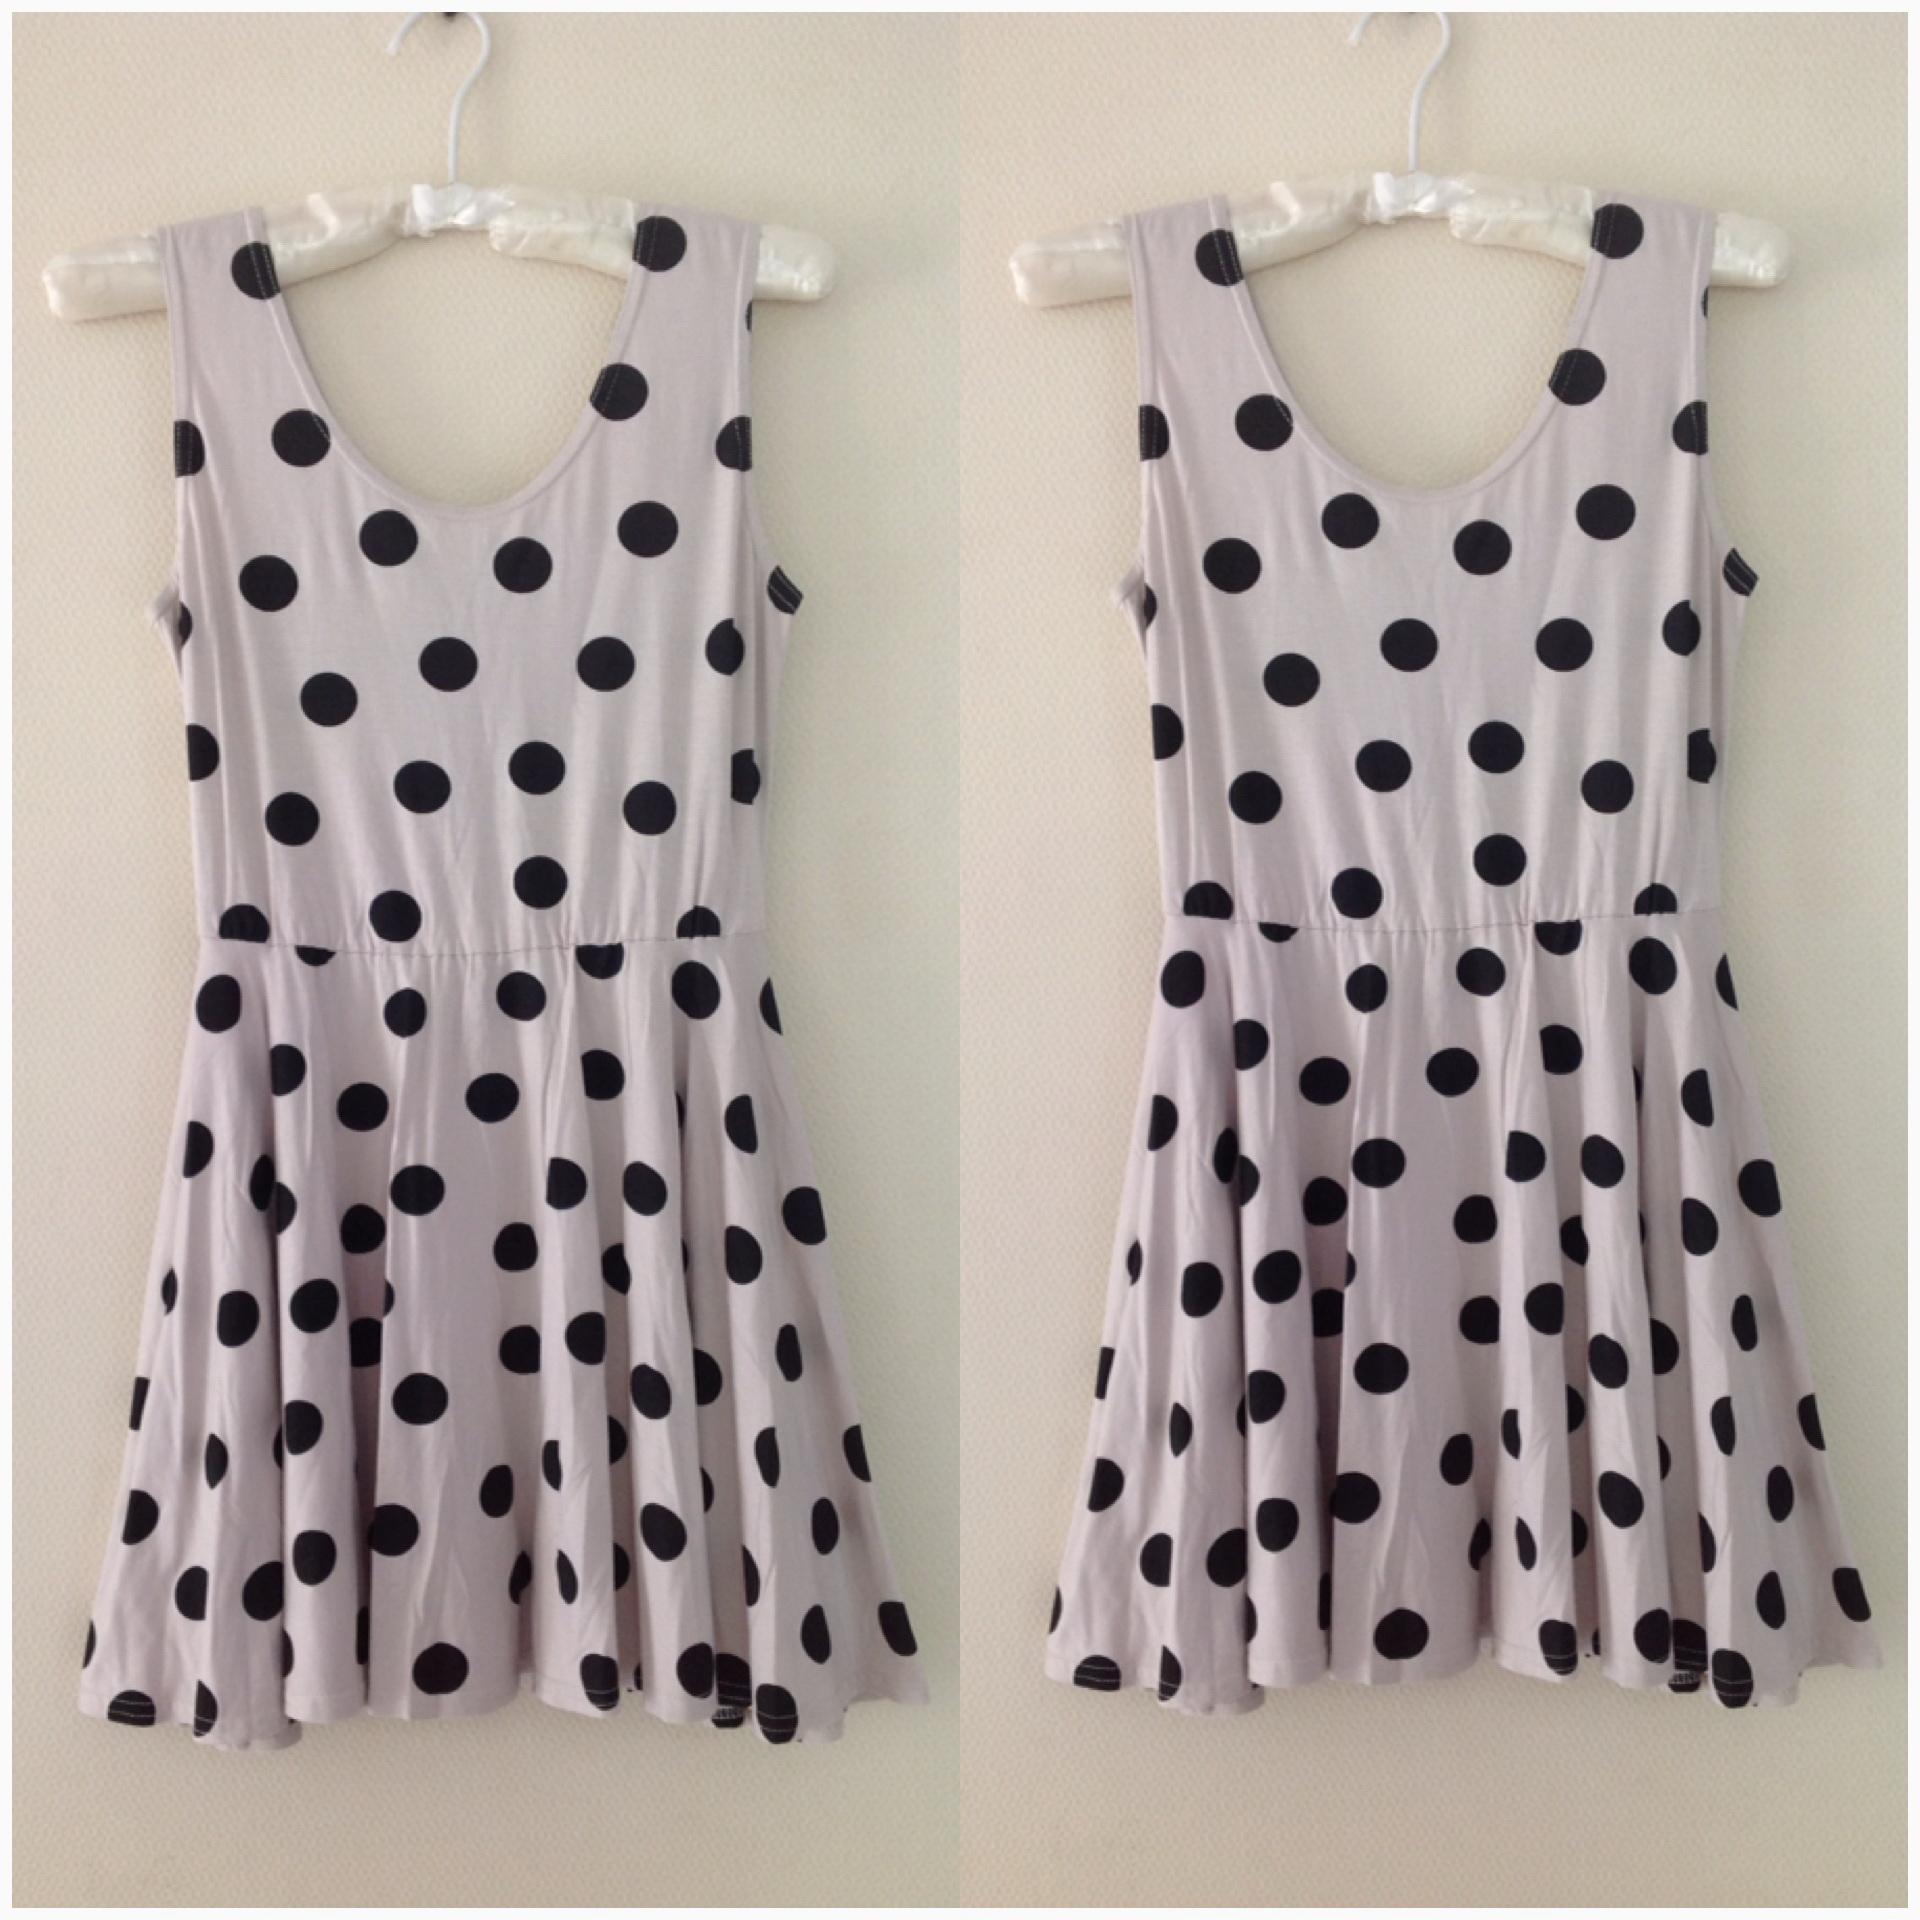 Topshop Polkadot Dress Size uk10-12